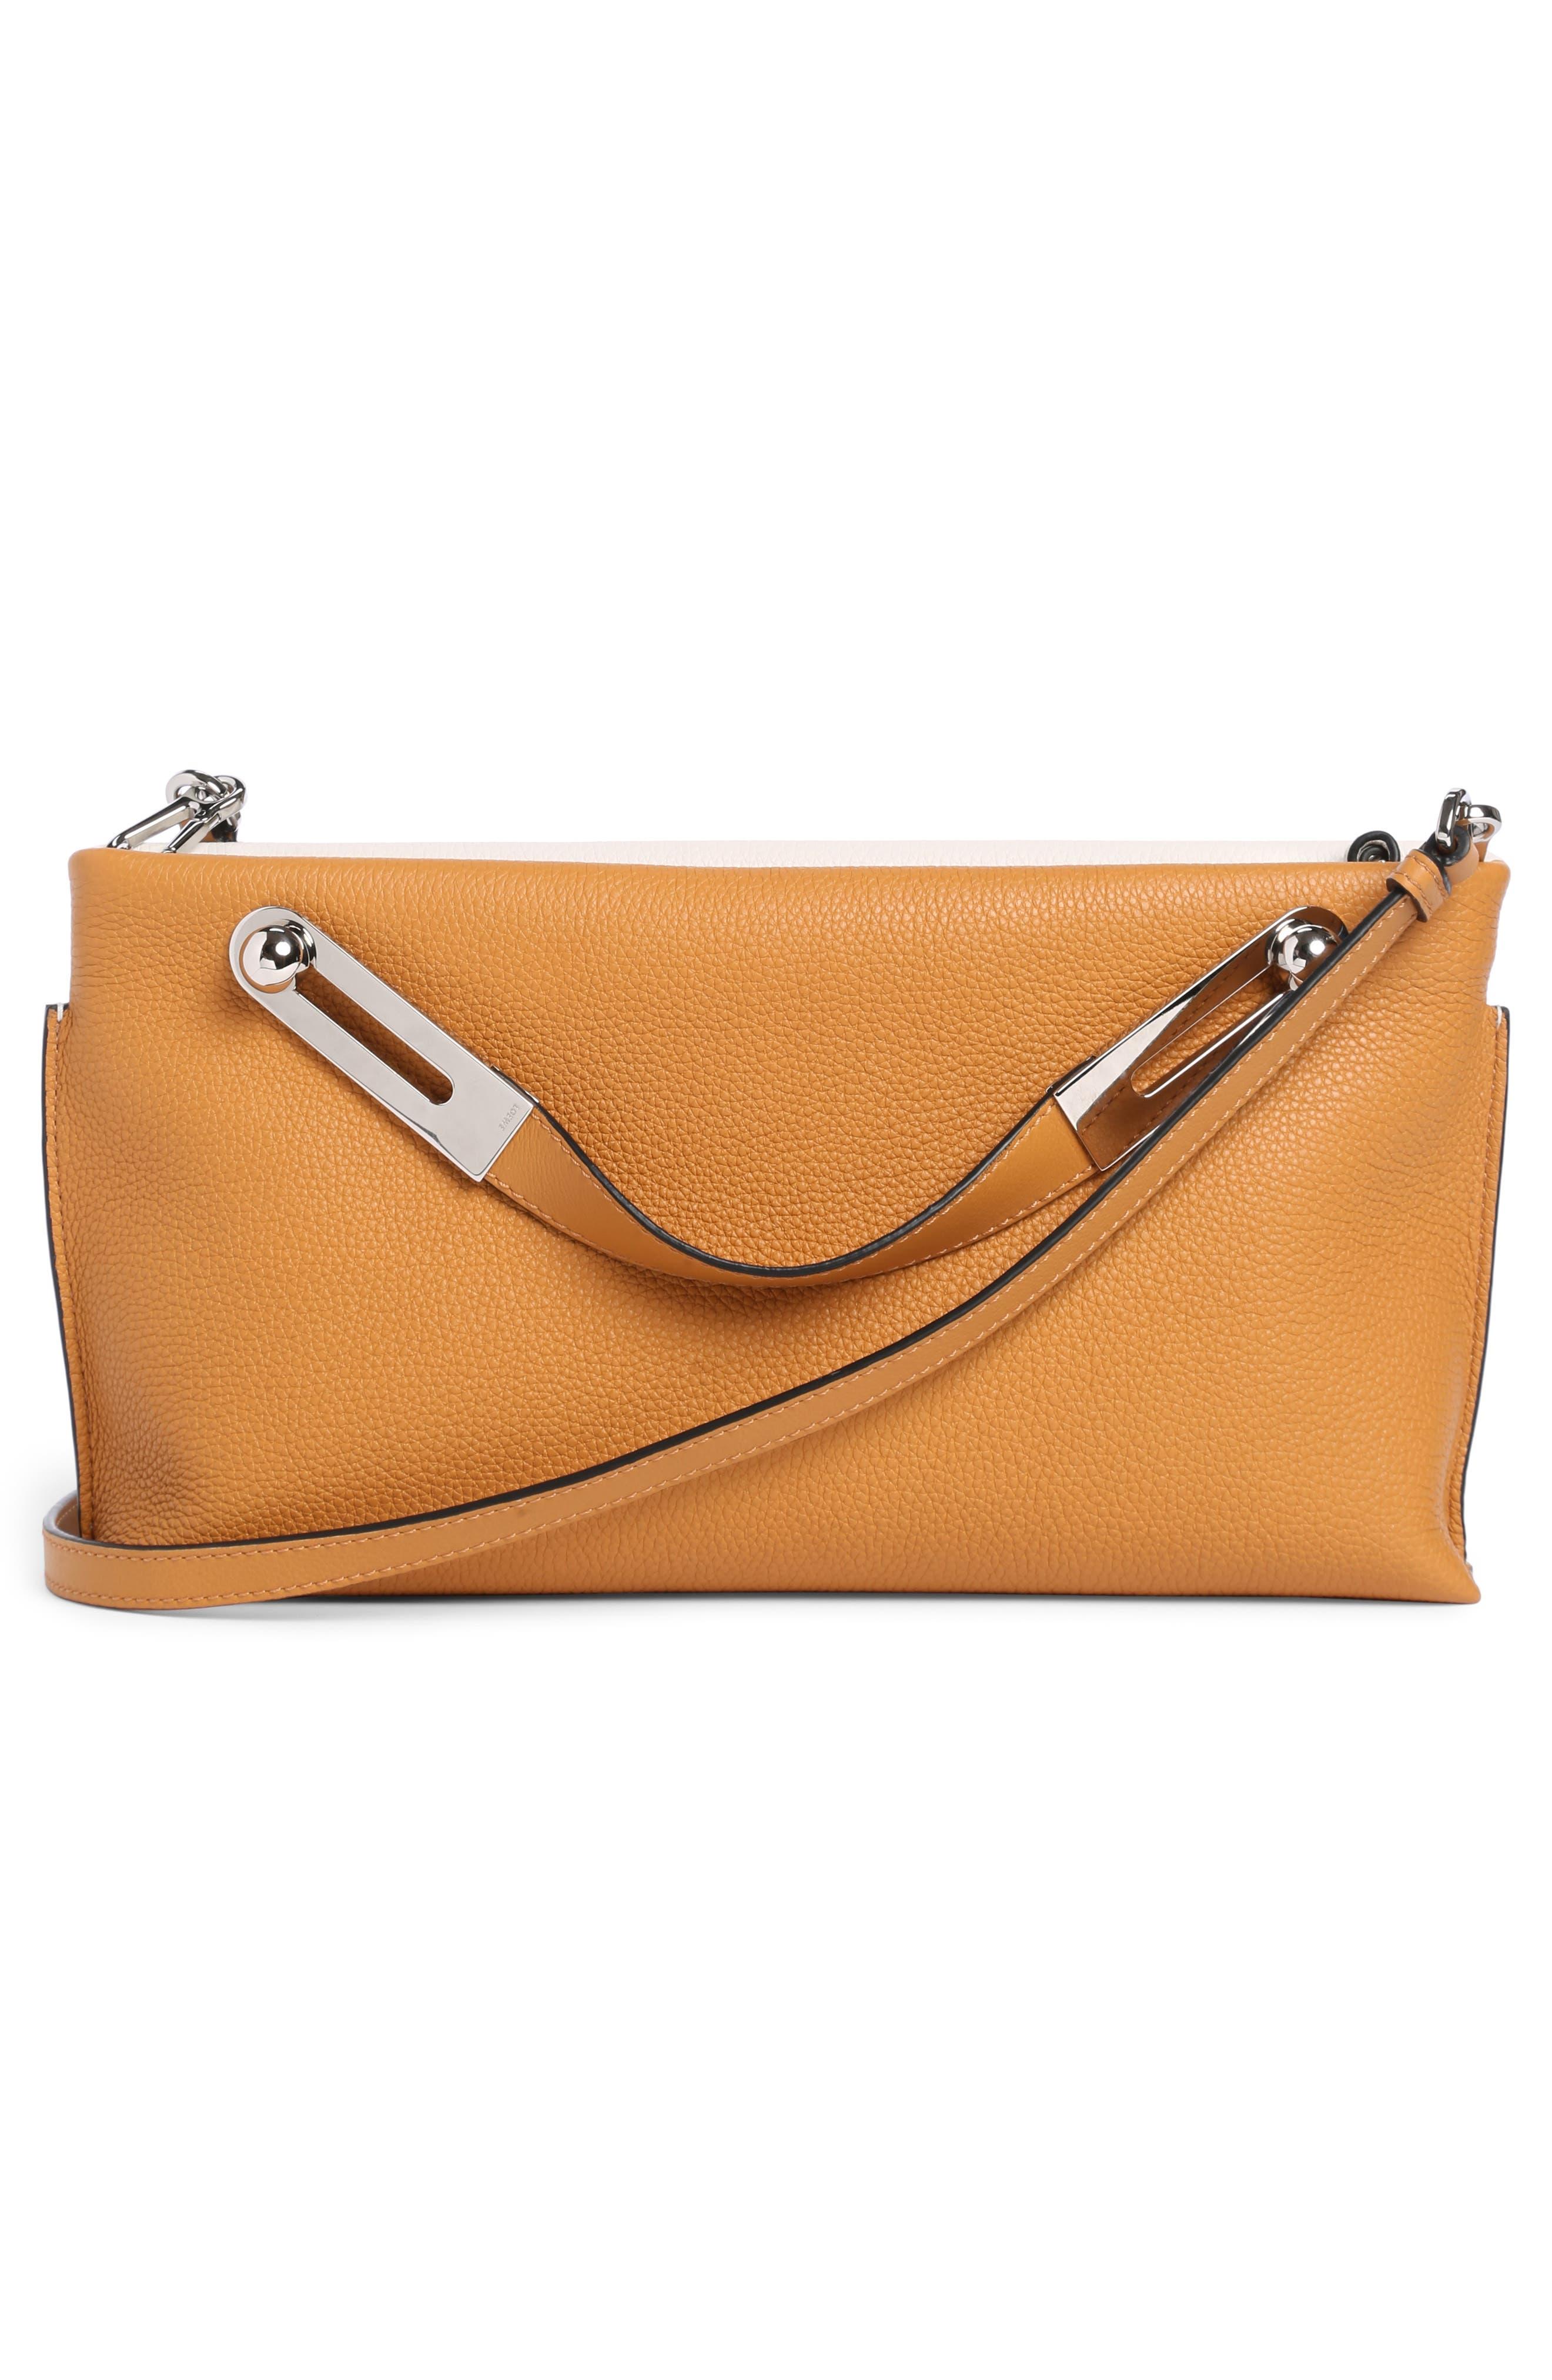 Small Missy Calfskin Leather Crossbody Bag,                             Alternate thumbnail 2, color,                             141